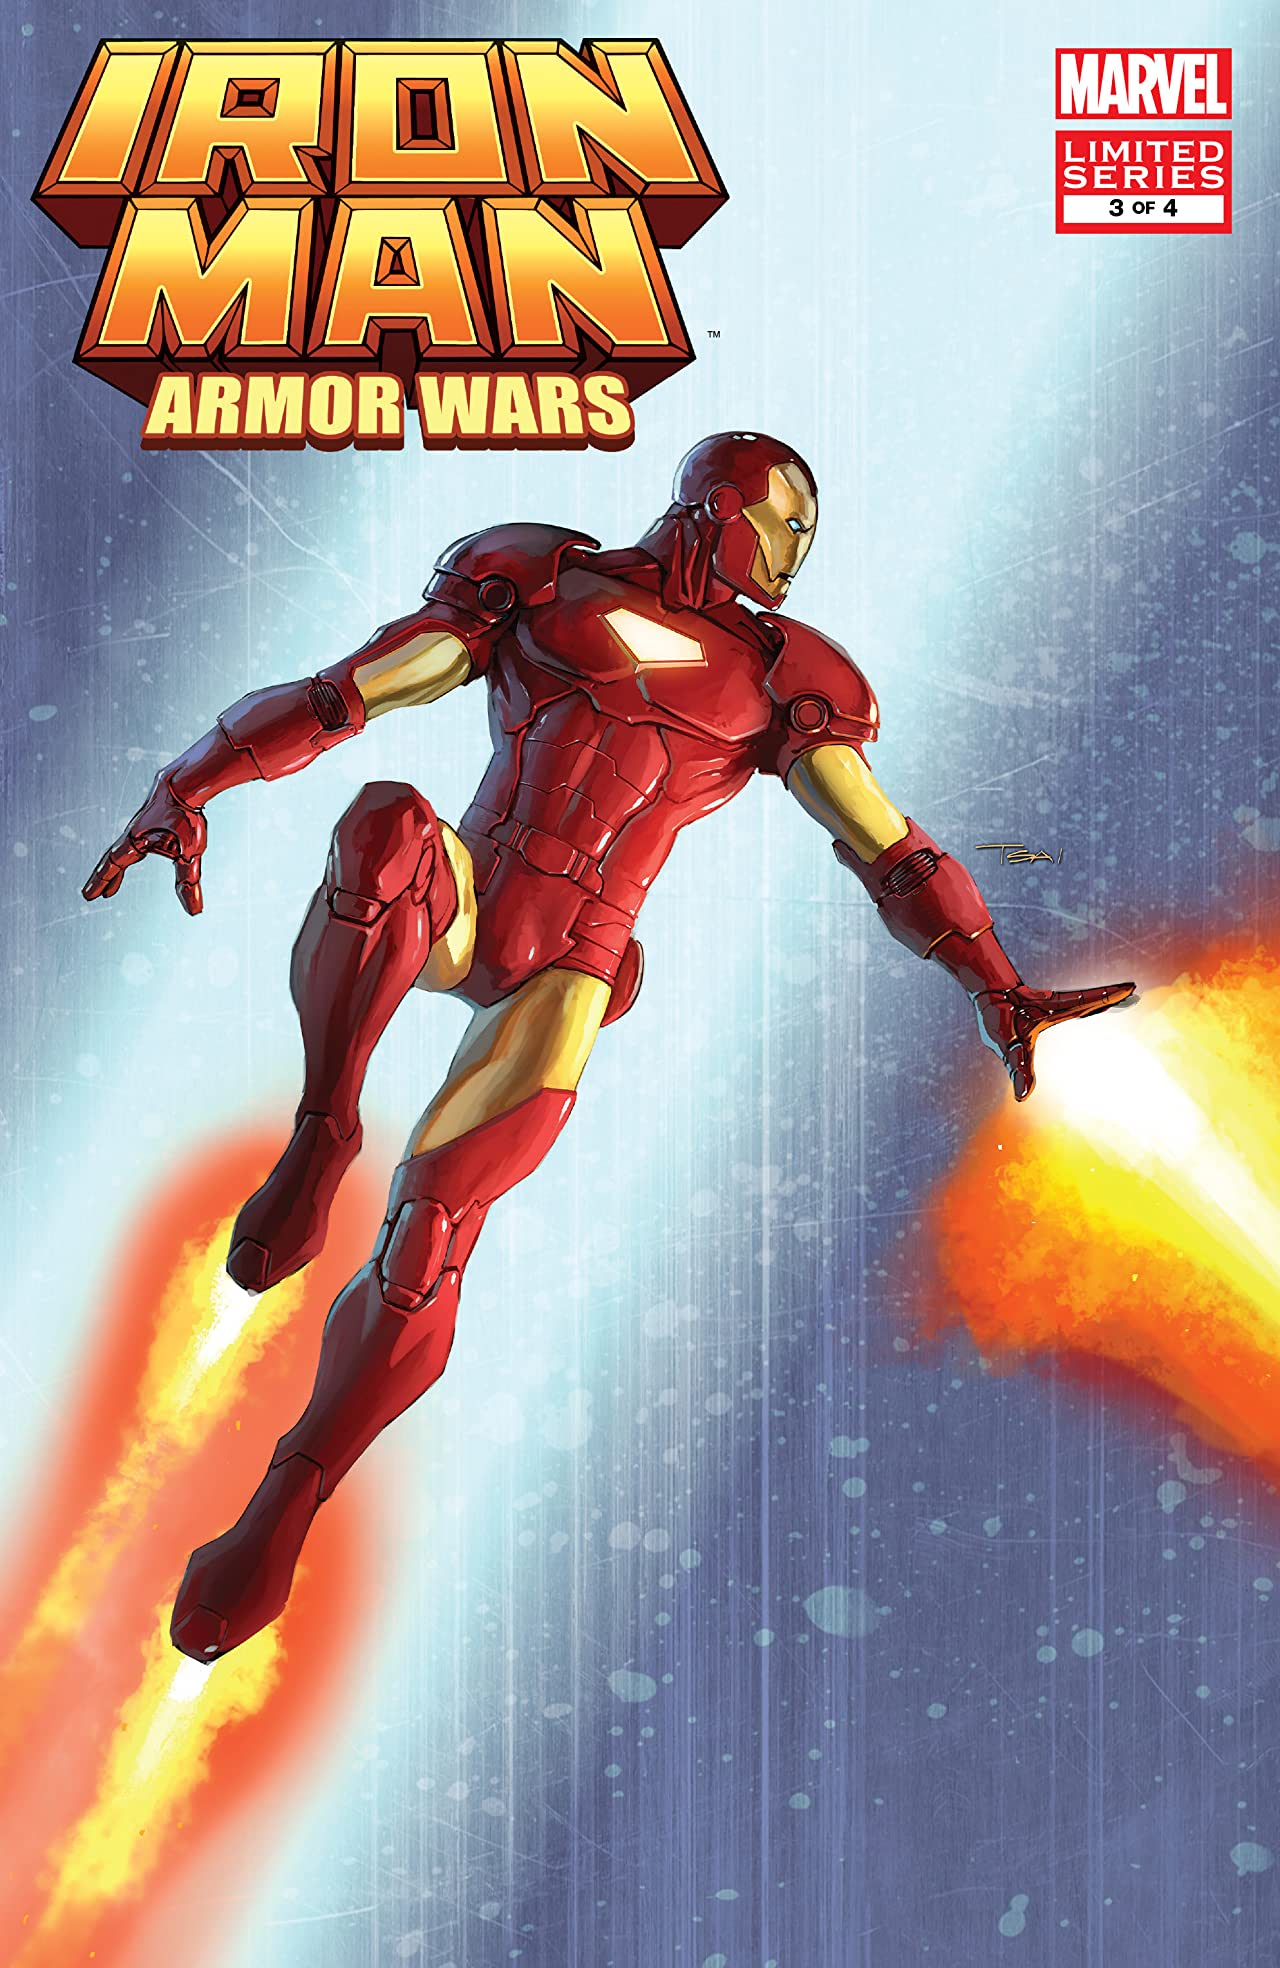 Iron Man & Armor Wars (2009) #3 (of 4)